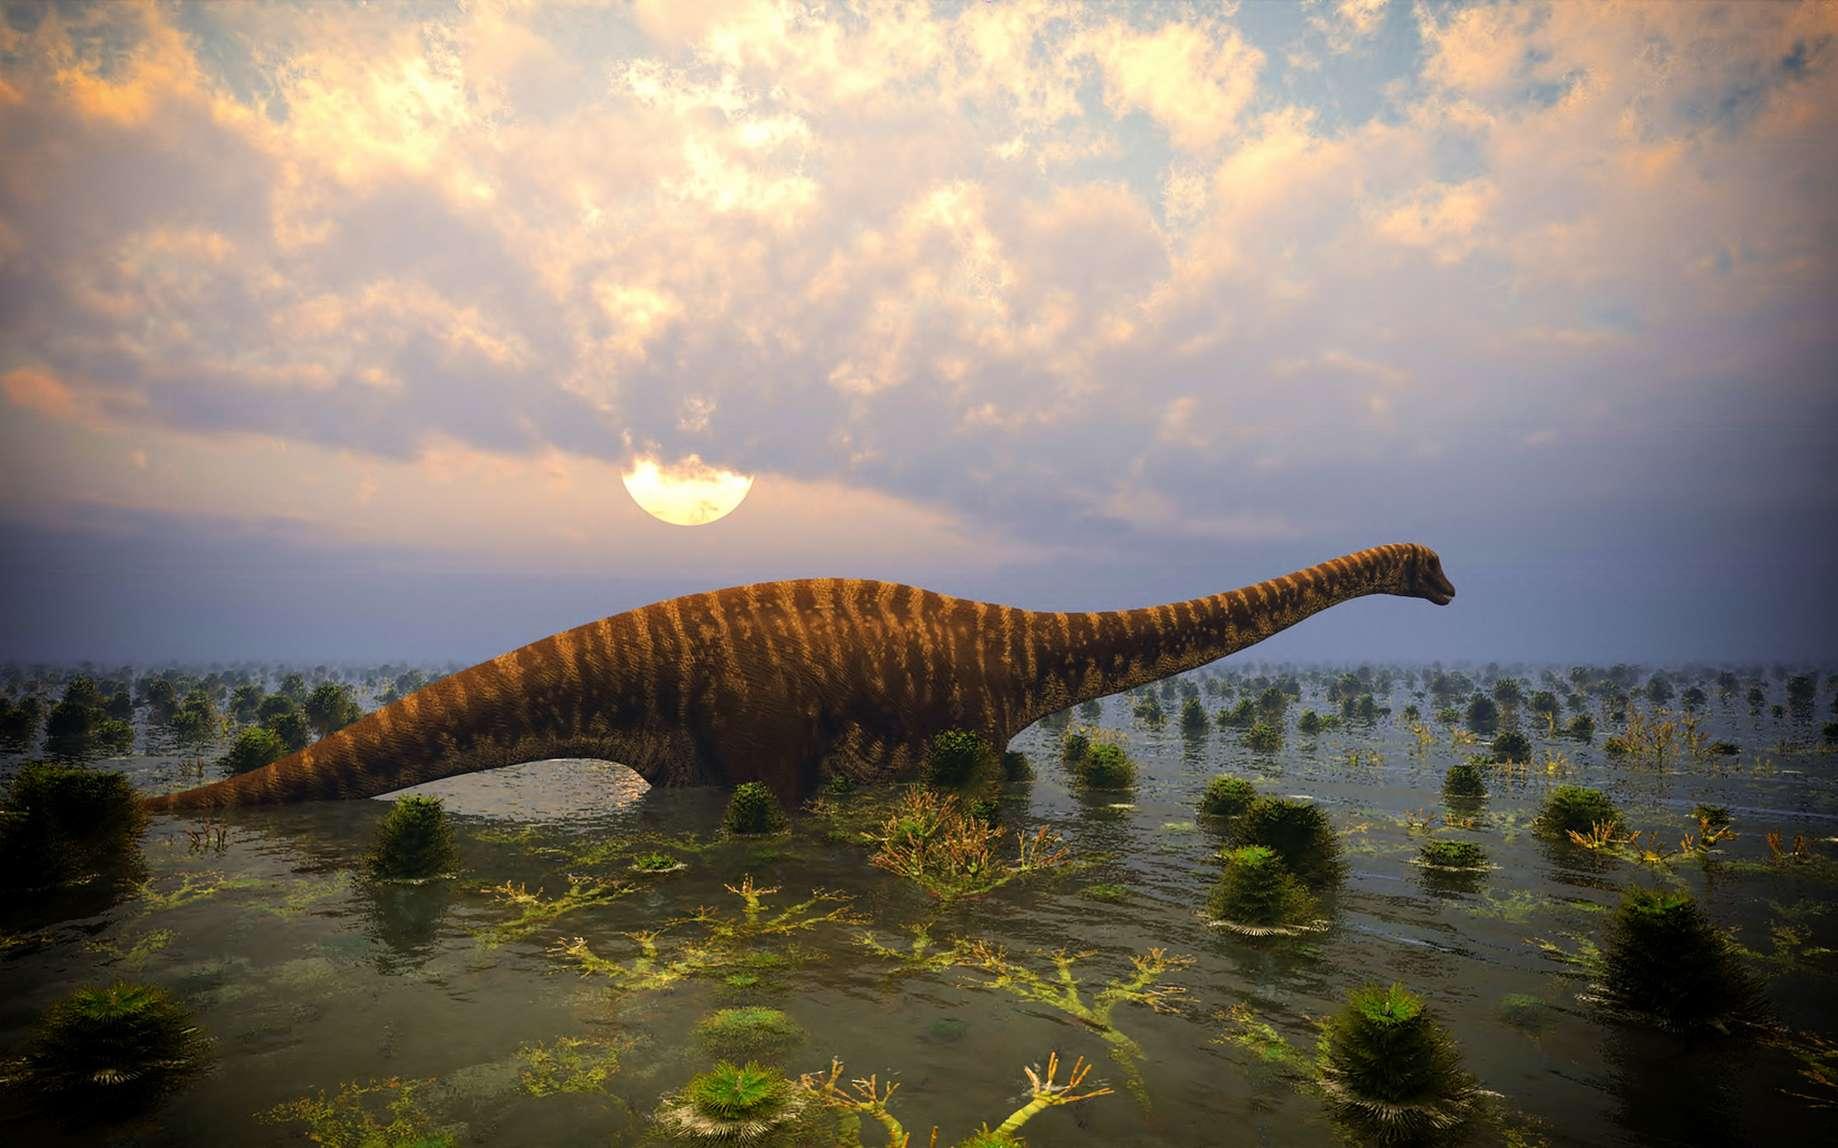 Macrocollum itaquii, le plus ancien dinosaure au long cou. © satori, Fotolia